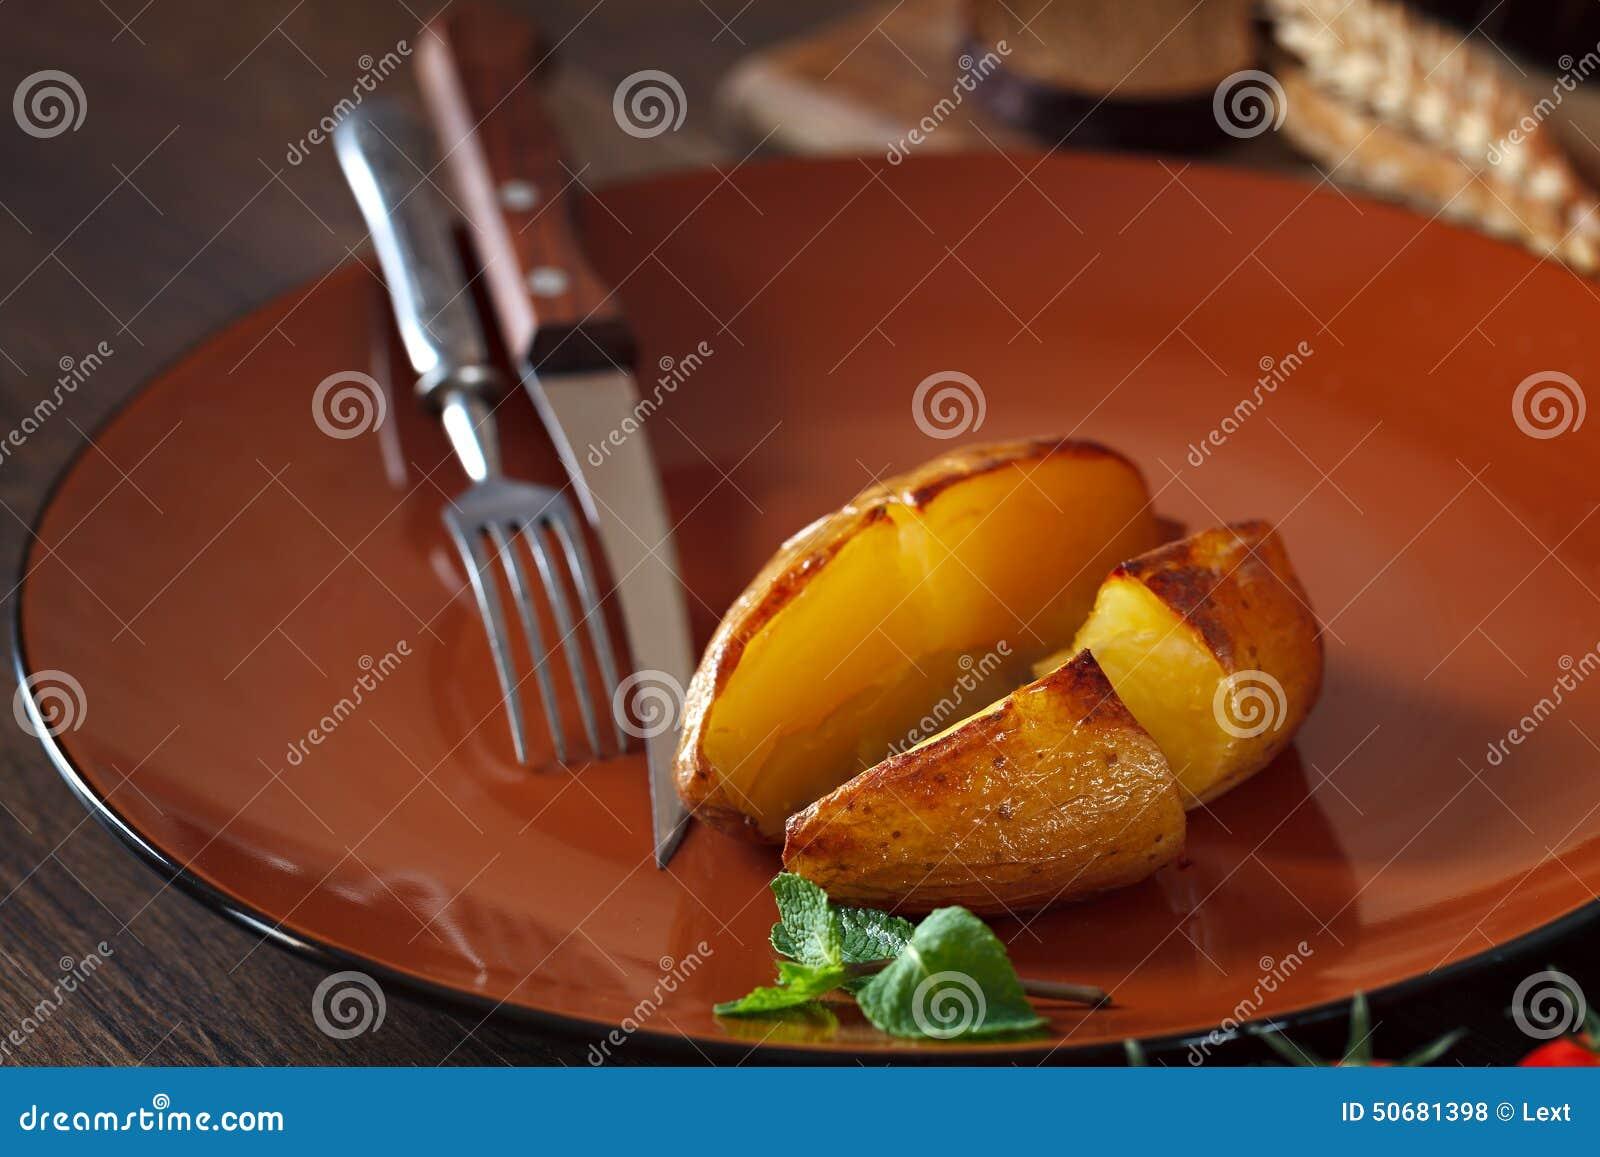 Download 土豆在桌上的黏土板材烘烤了 库存照片. 图片 包括有 巴西, 午餐, 叉子, 瓦器, 的treadled - 50681398